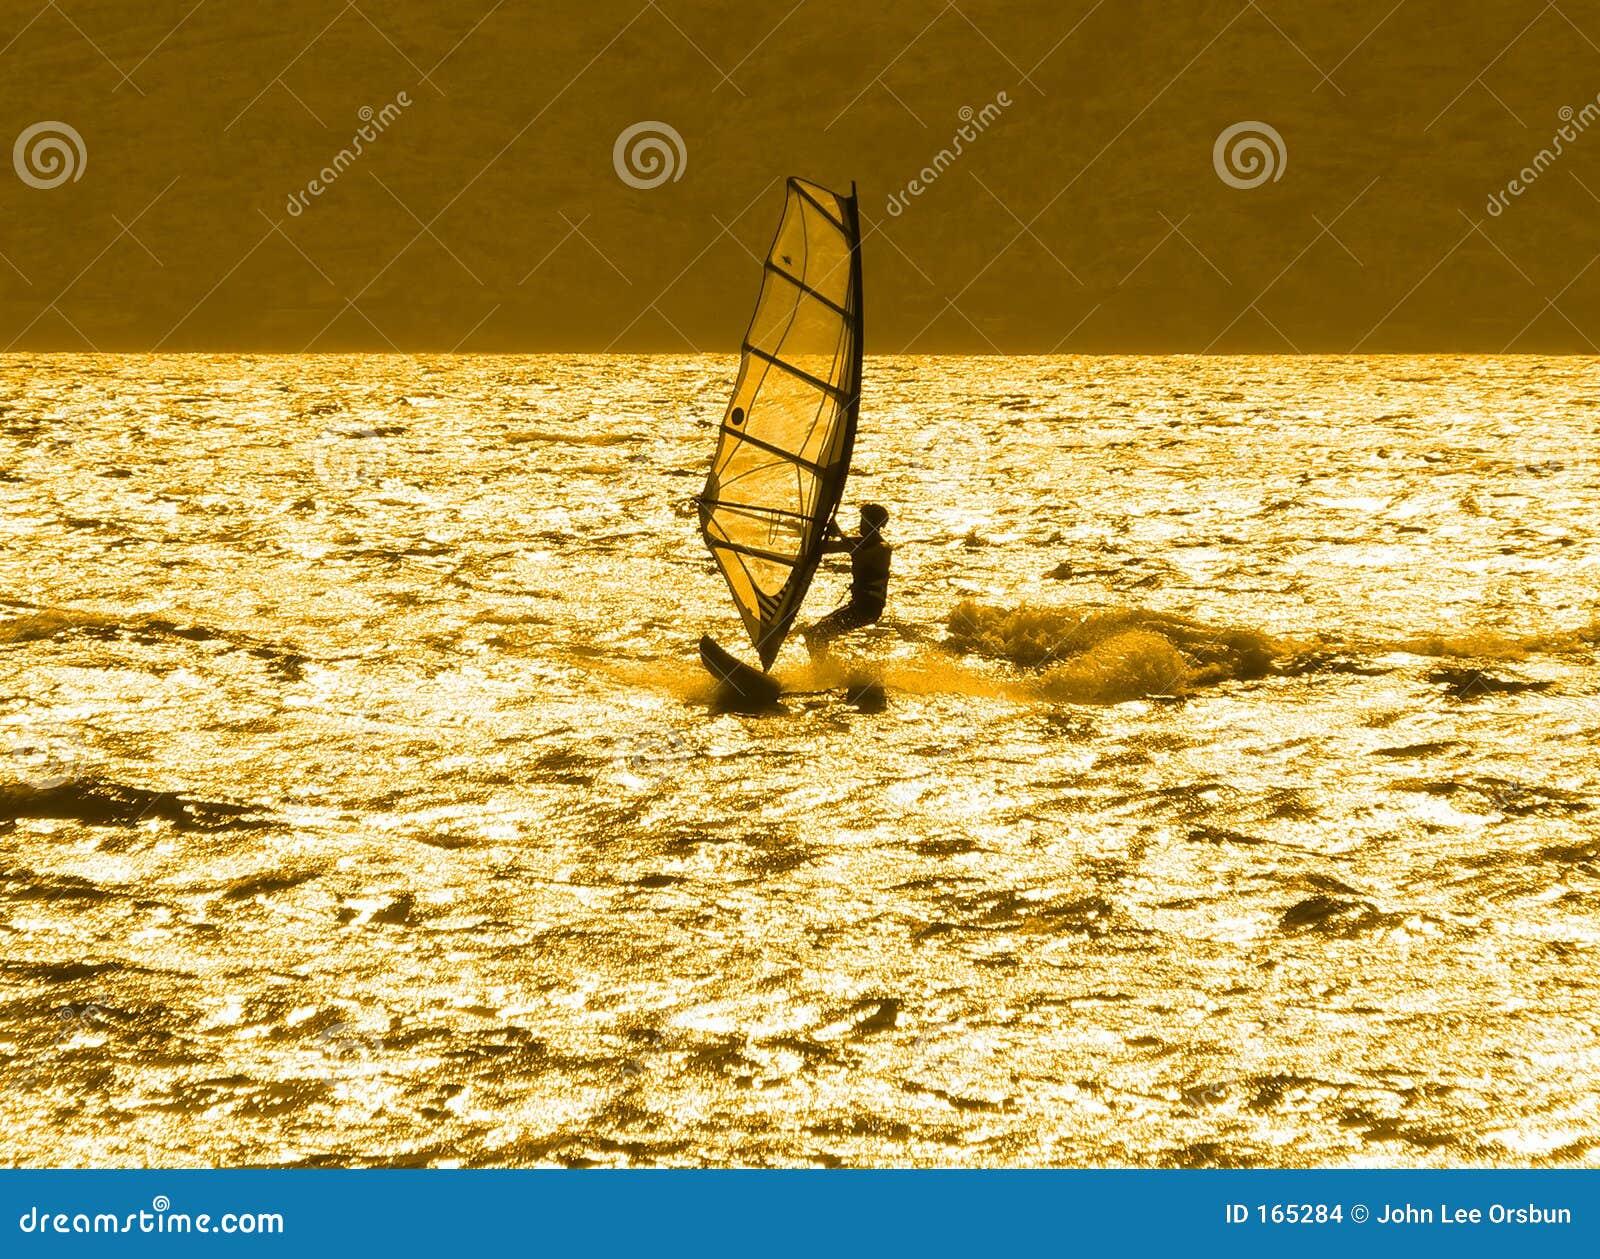 Lone windsurfer at sunset